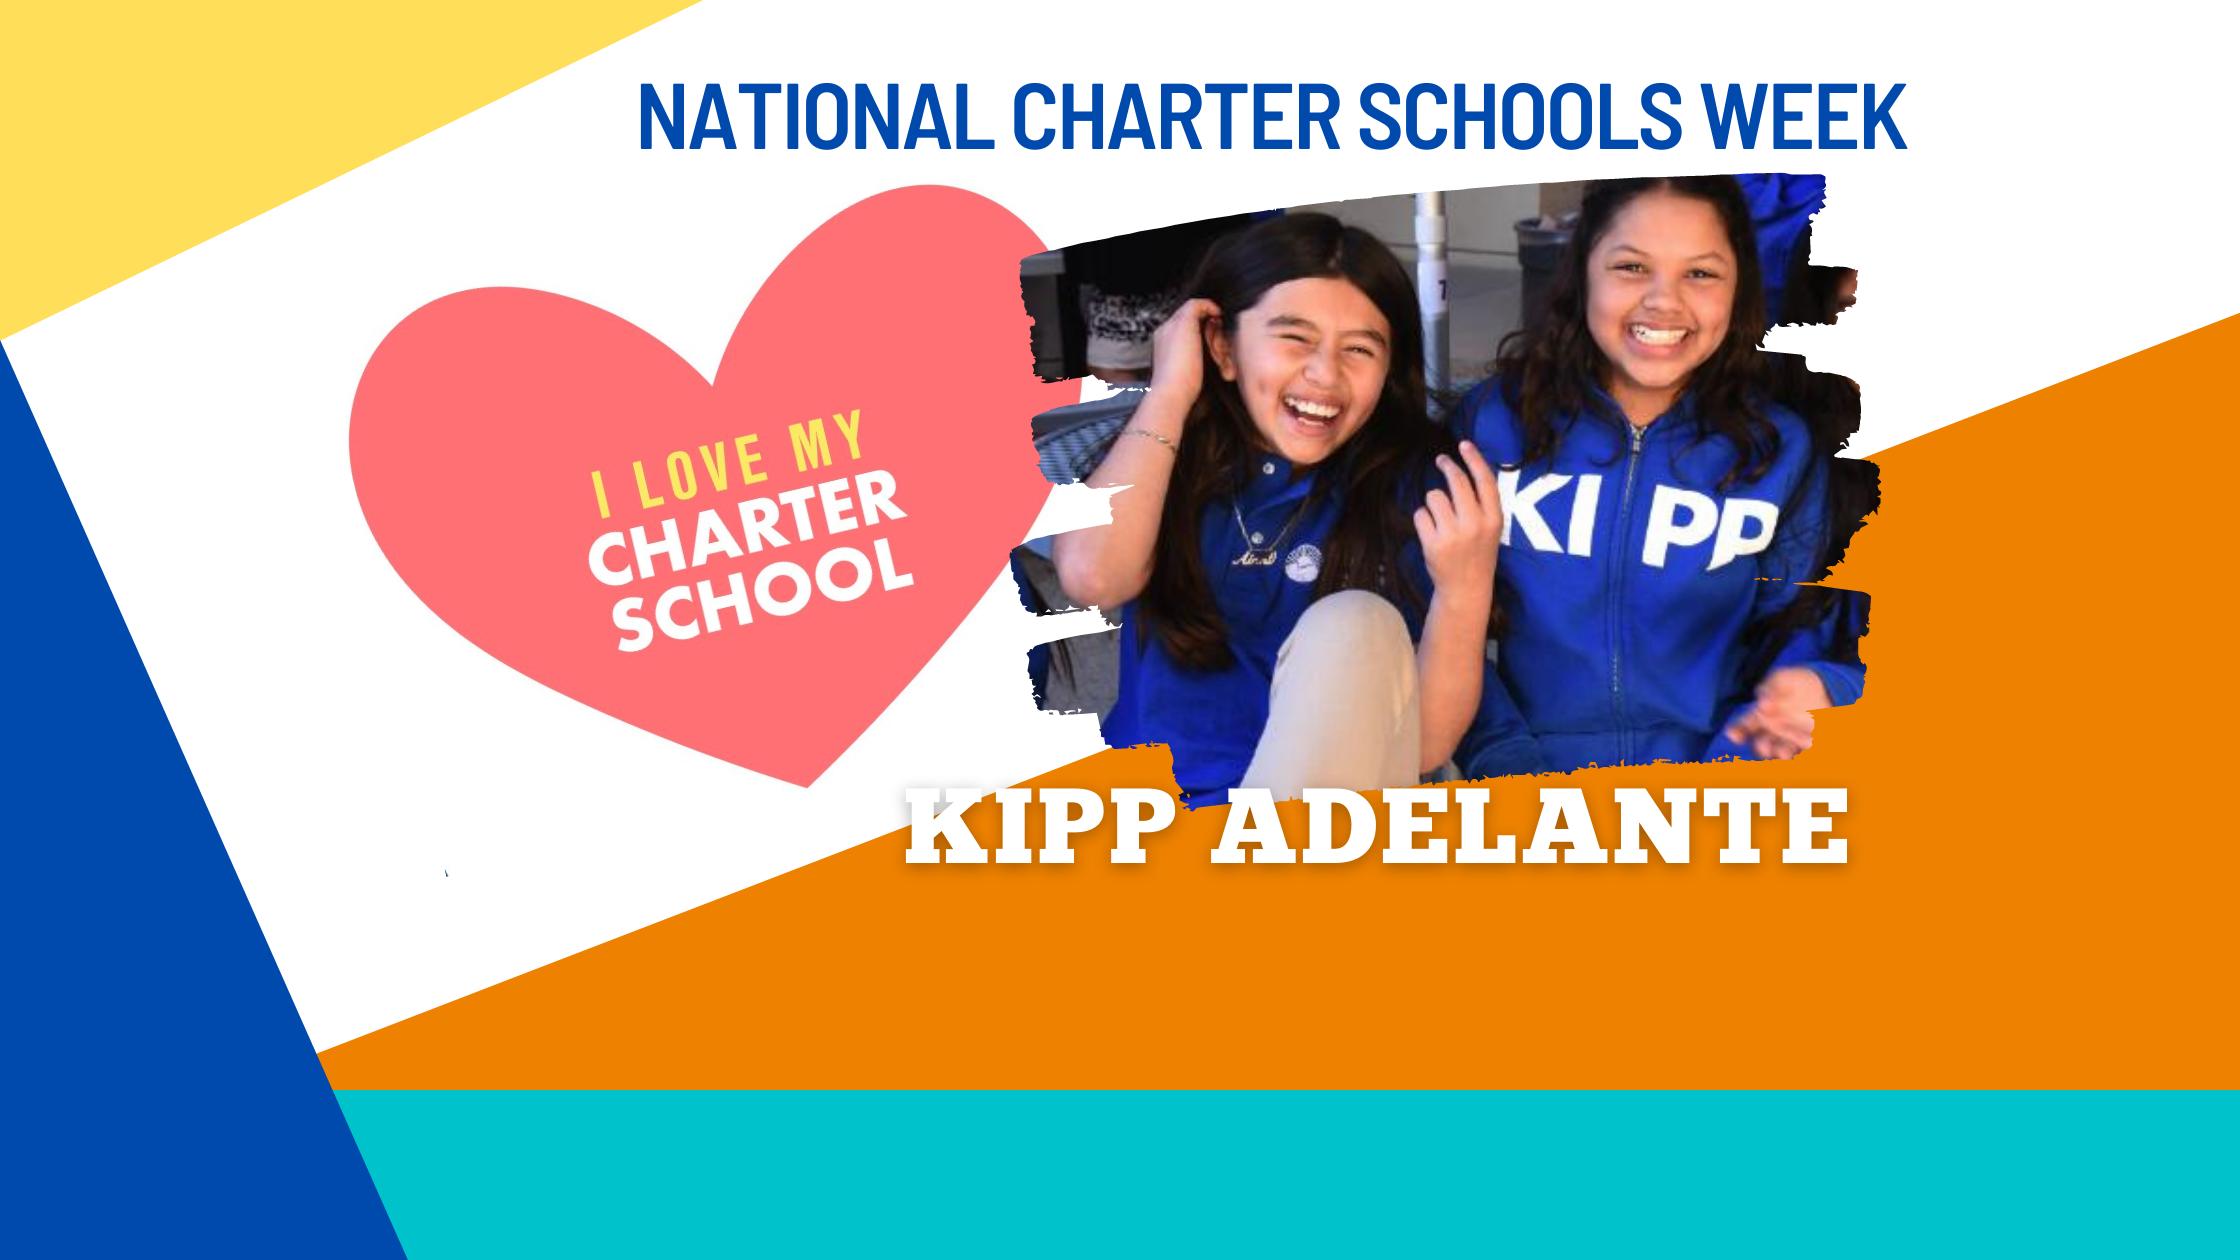 Giving Some #CharterSchooLove to KIPP Adelante